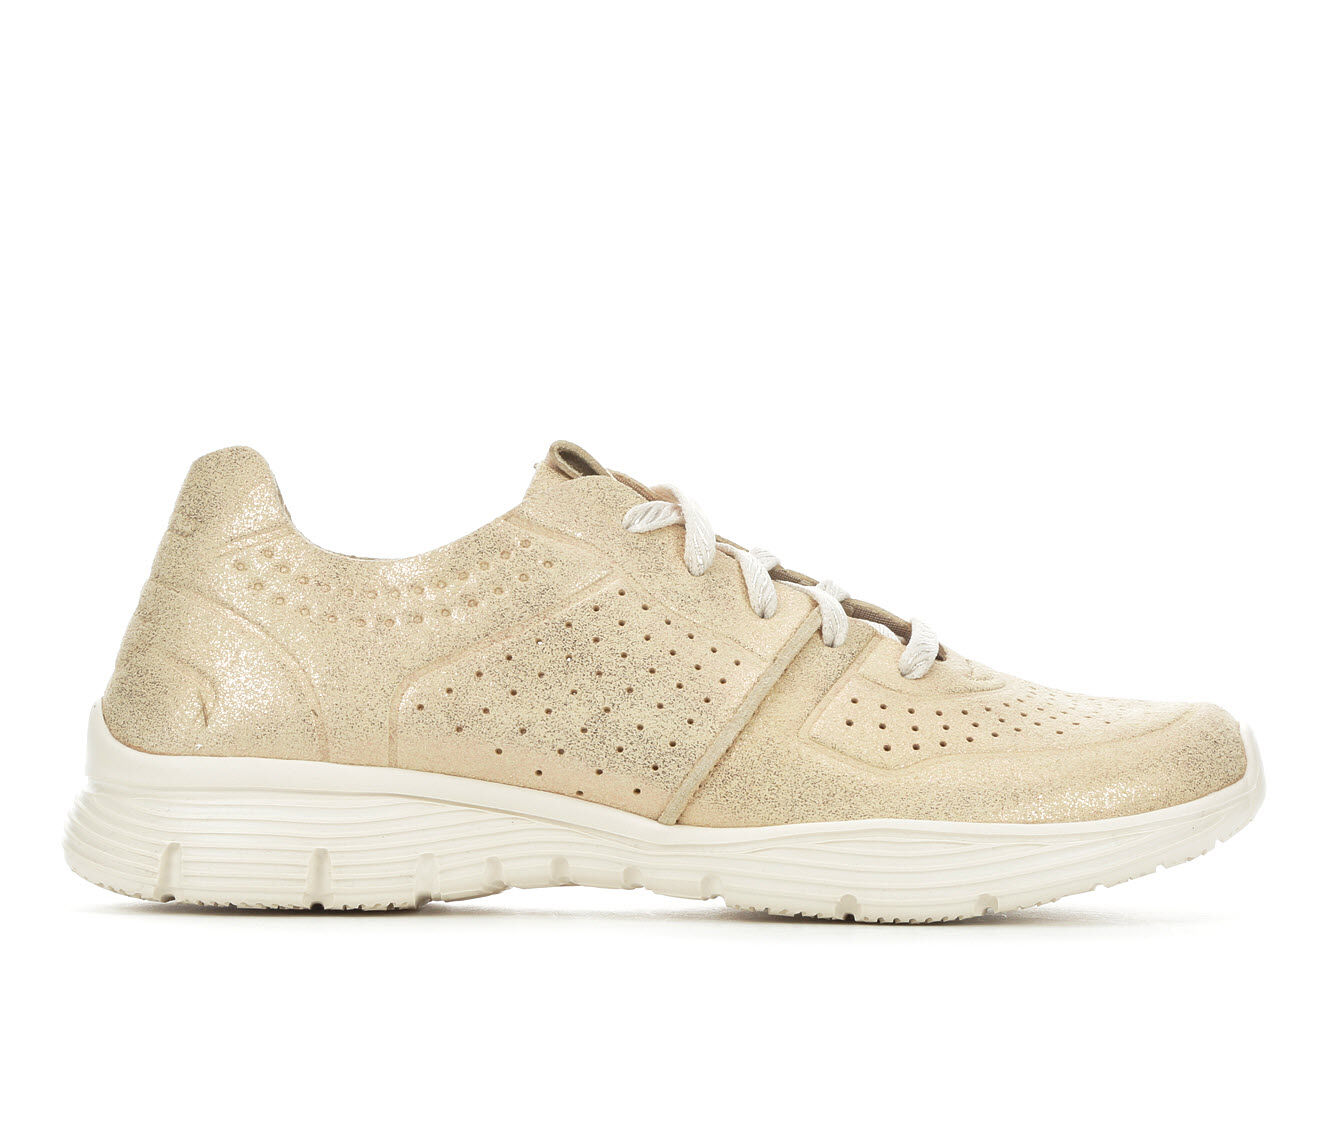 purchase new arrivals Women's Skechers Major League 49626 Sneakers Gold